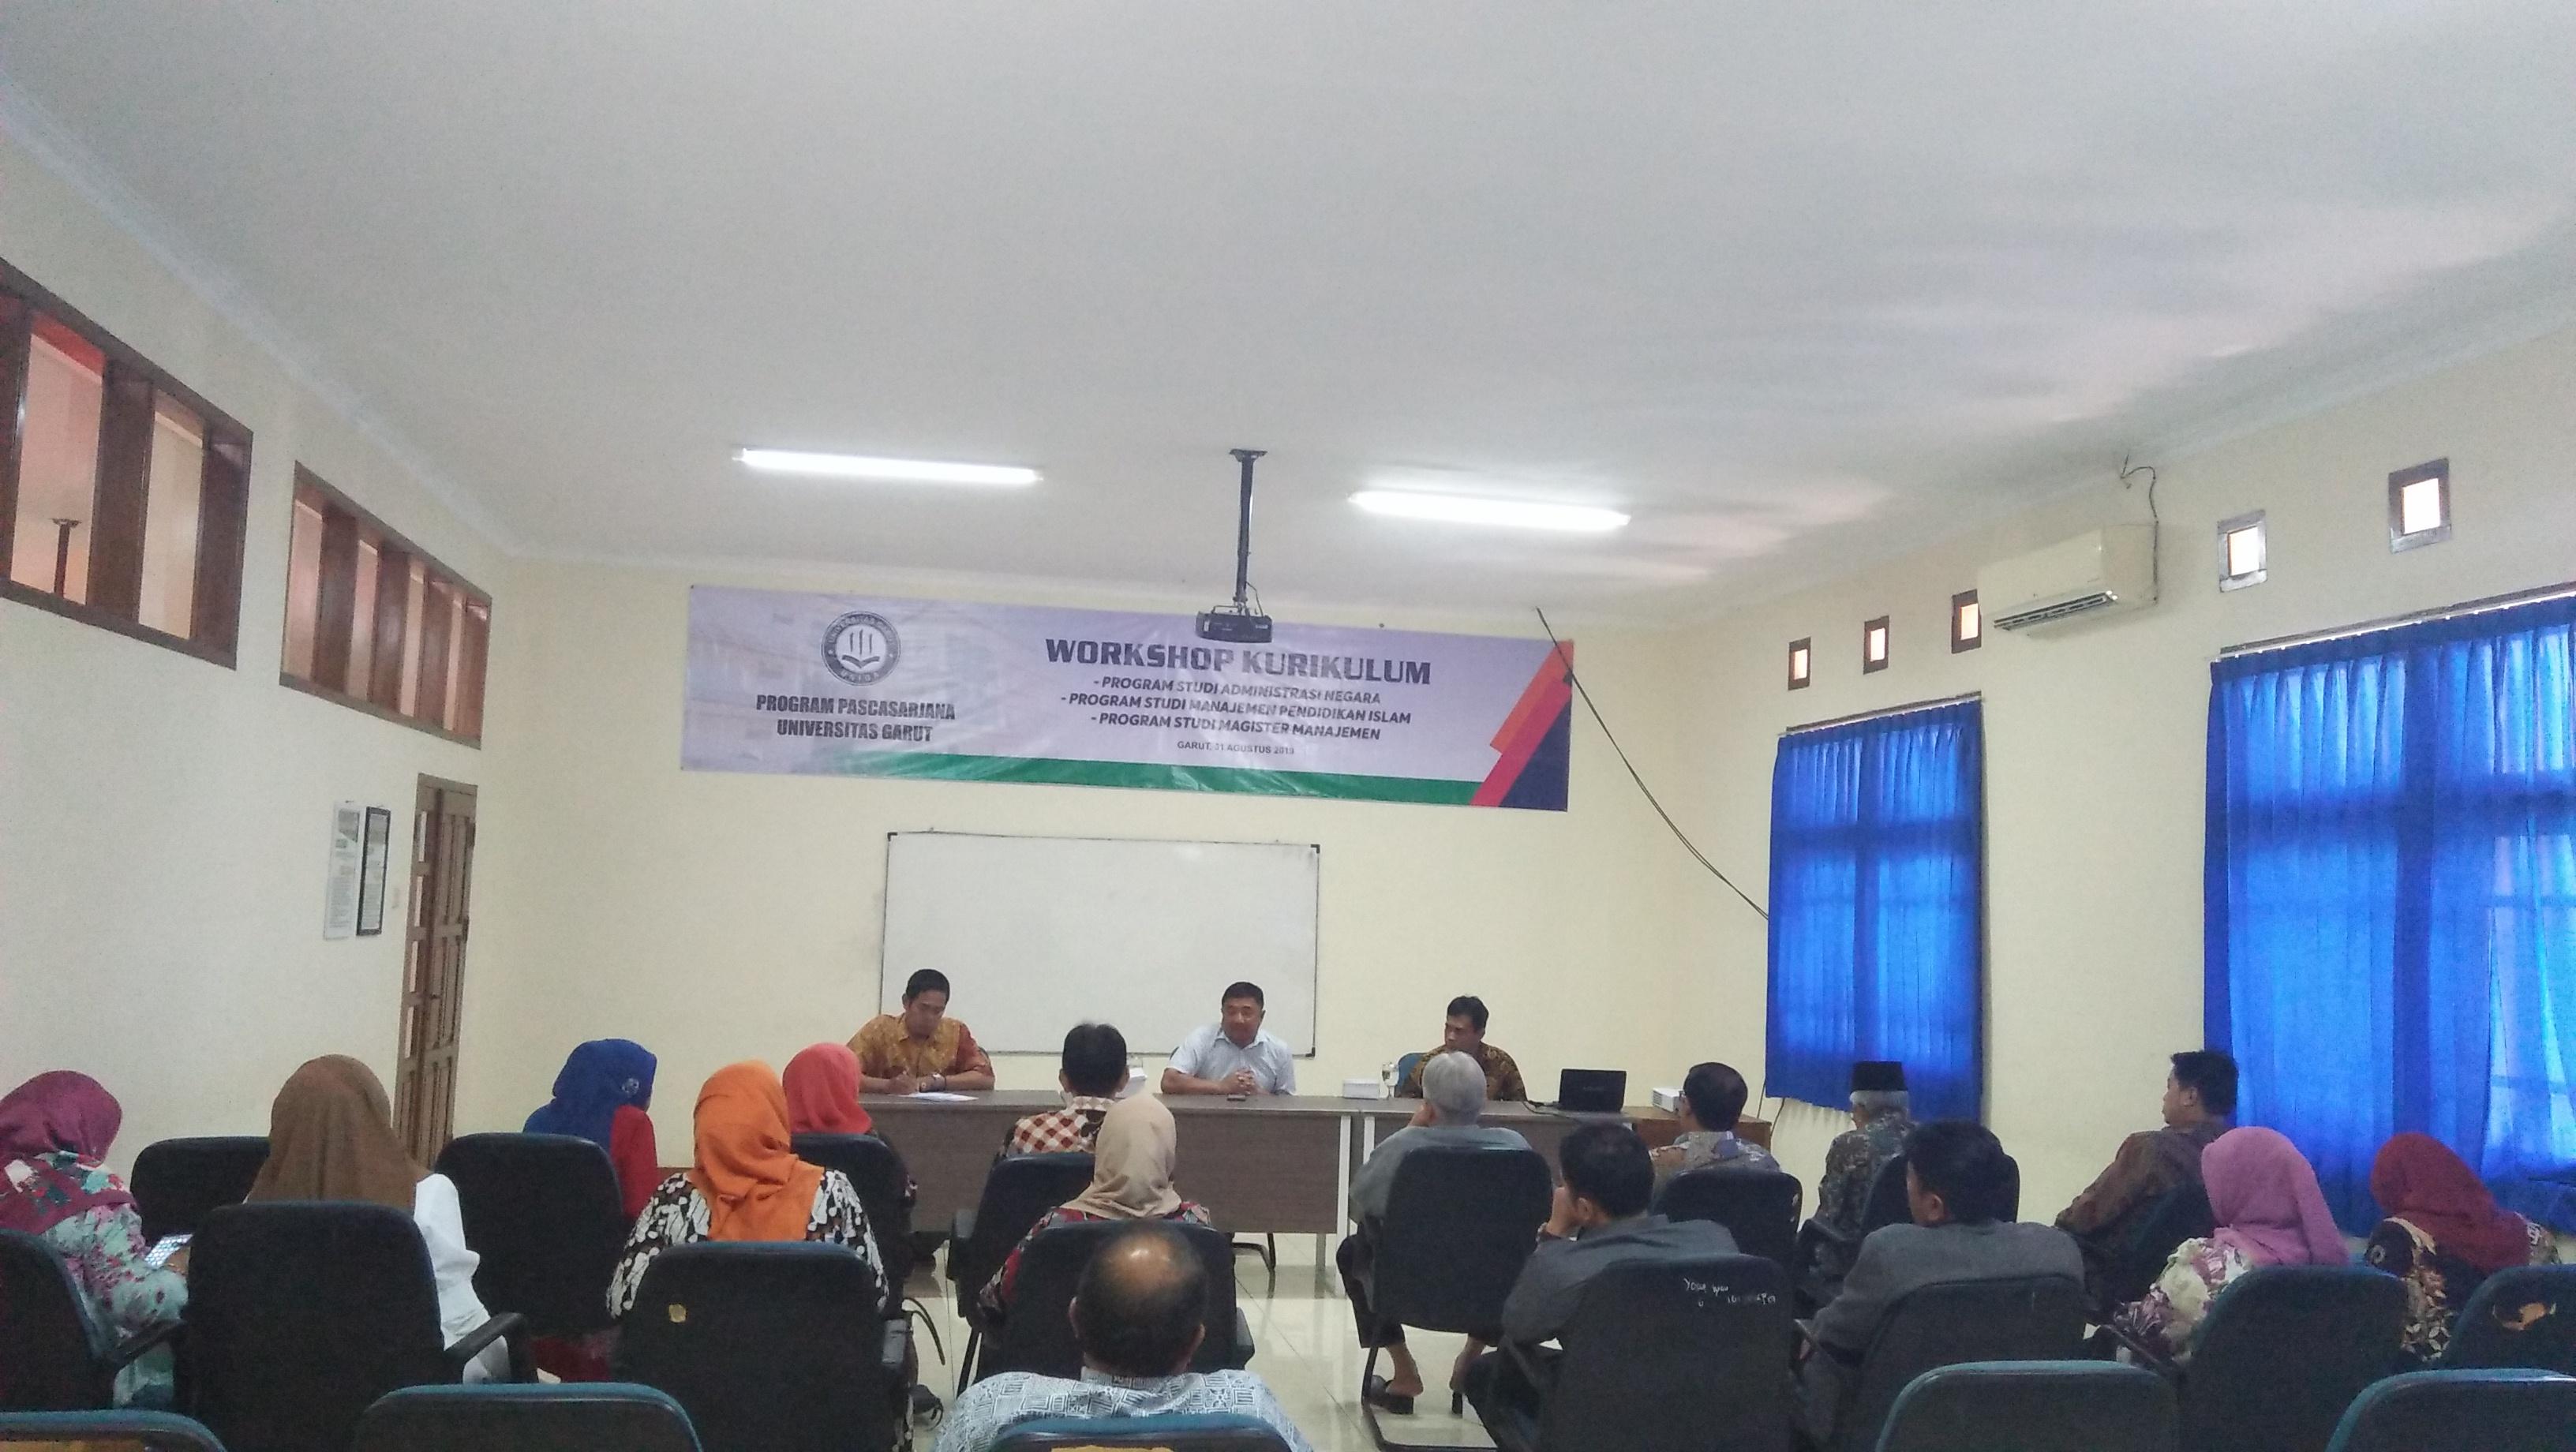 Rapat Workshop Kurikulum Program pascasarjana Universitas Garut Tahun 2019/2020